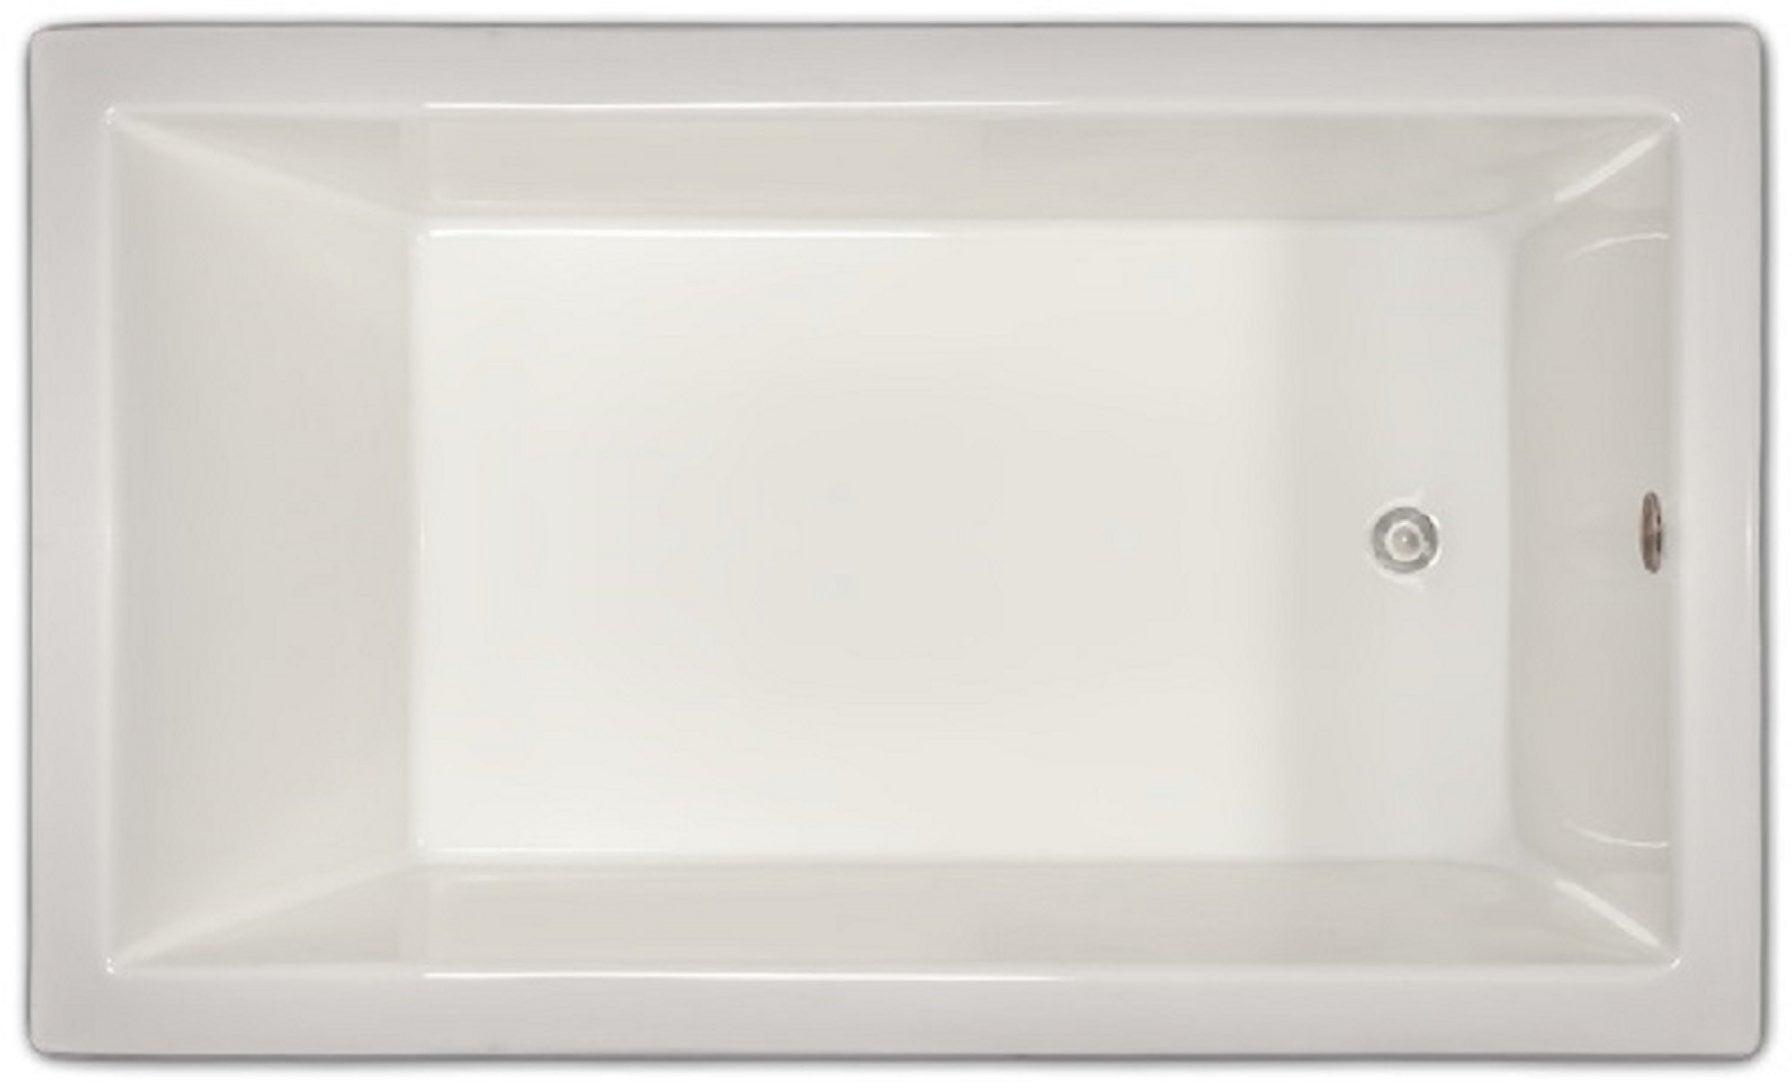 Drop-in Bathtub / 59.5x35.5x19 / high gloss white acrylic / Rectangle / LPI18-S Pinnacle Bath - Soaker 0